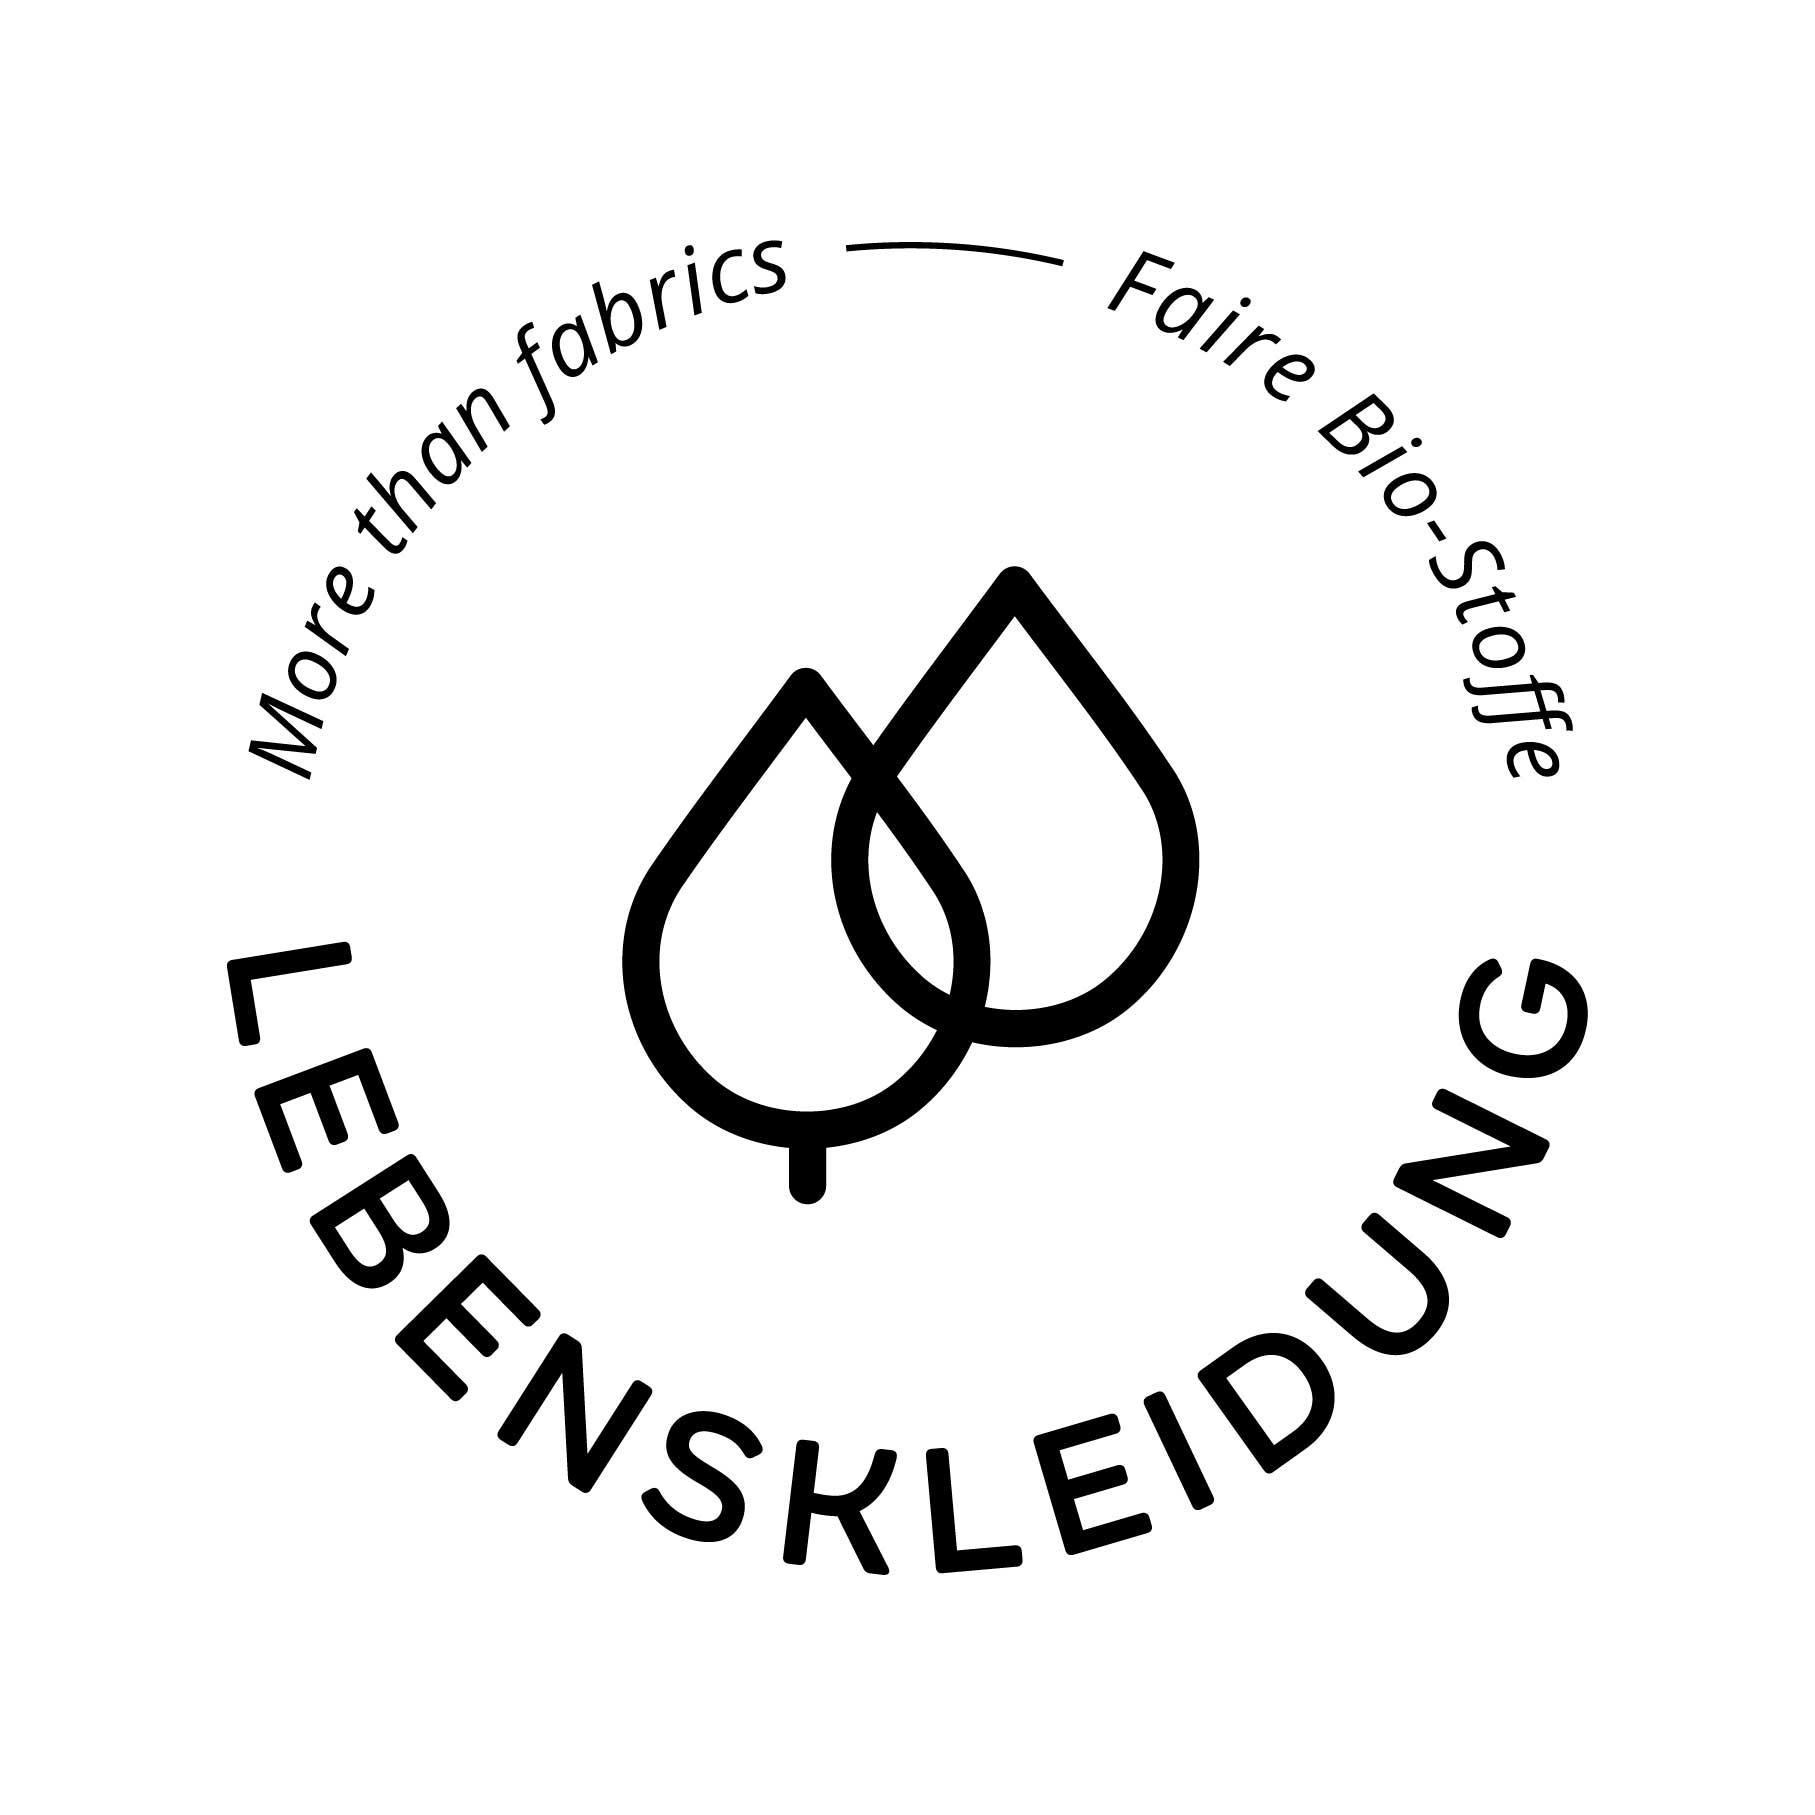 Bio Tessuto di RIB 2x1 (Polsino) - Nero Screziato